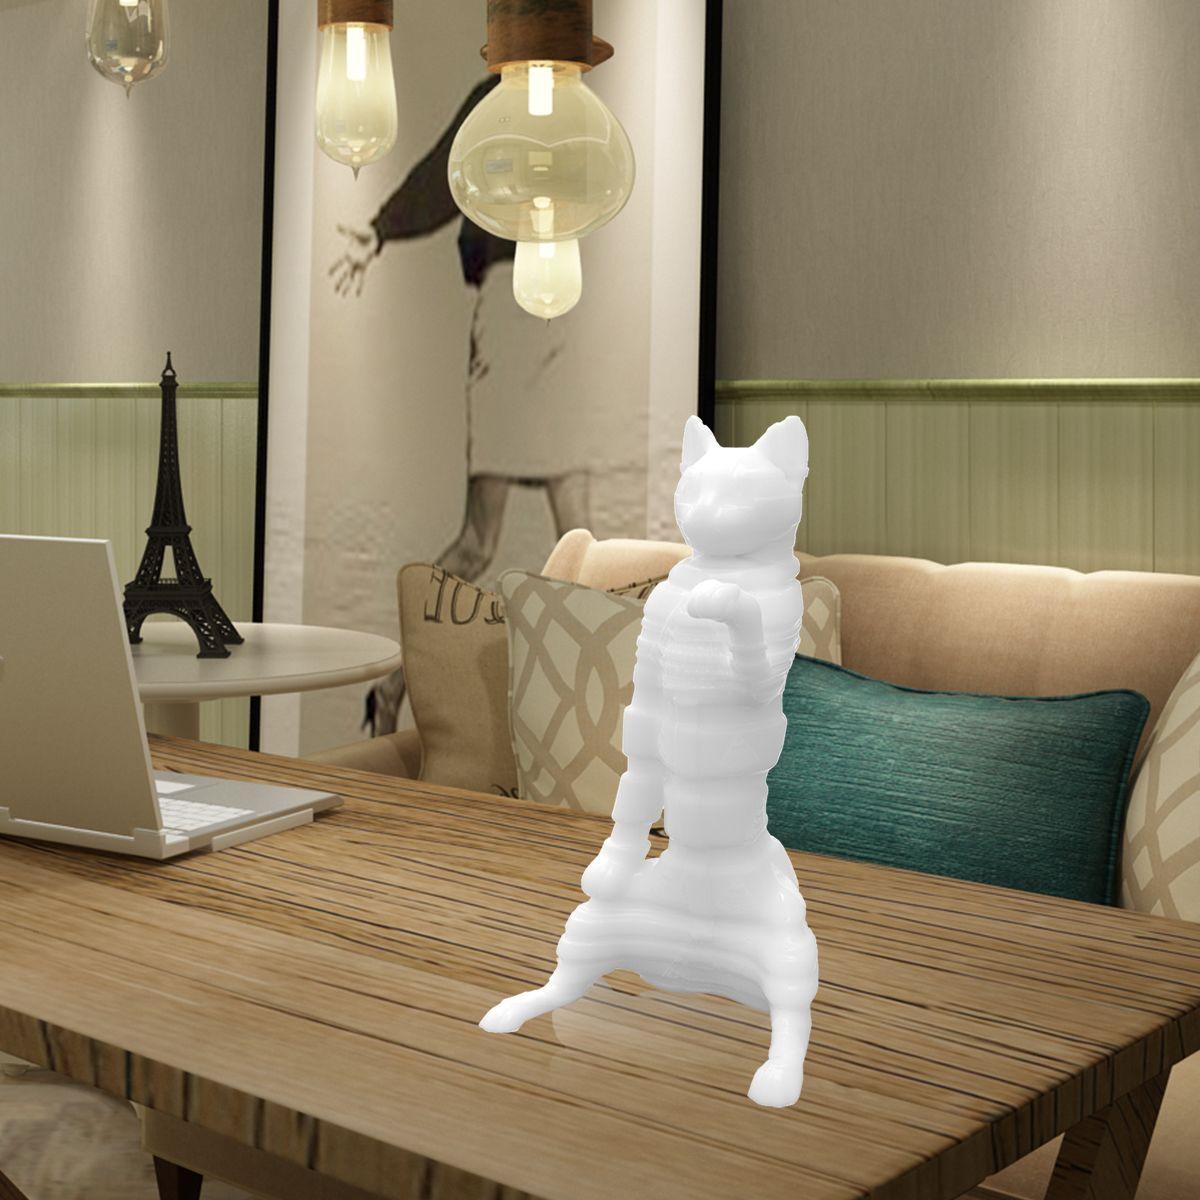 Tomfeel 3D Printed Sculpture Mummy Cat Originally Designed Home Decor